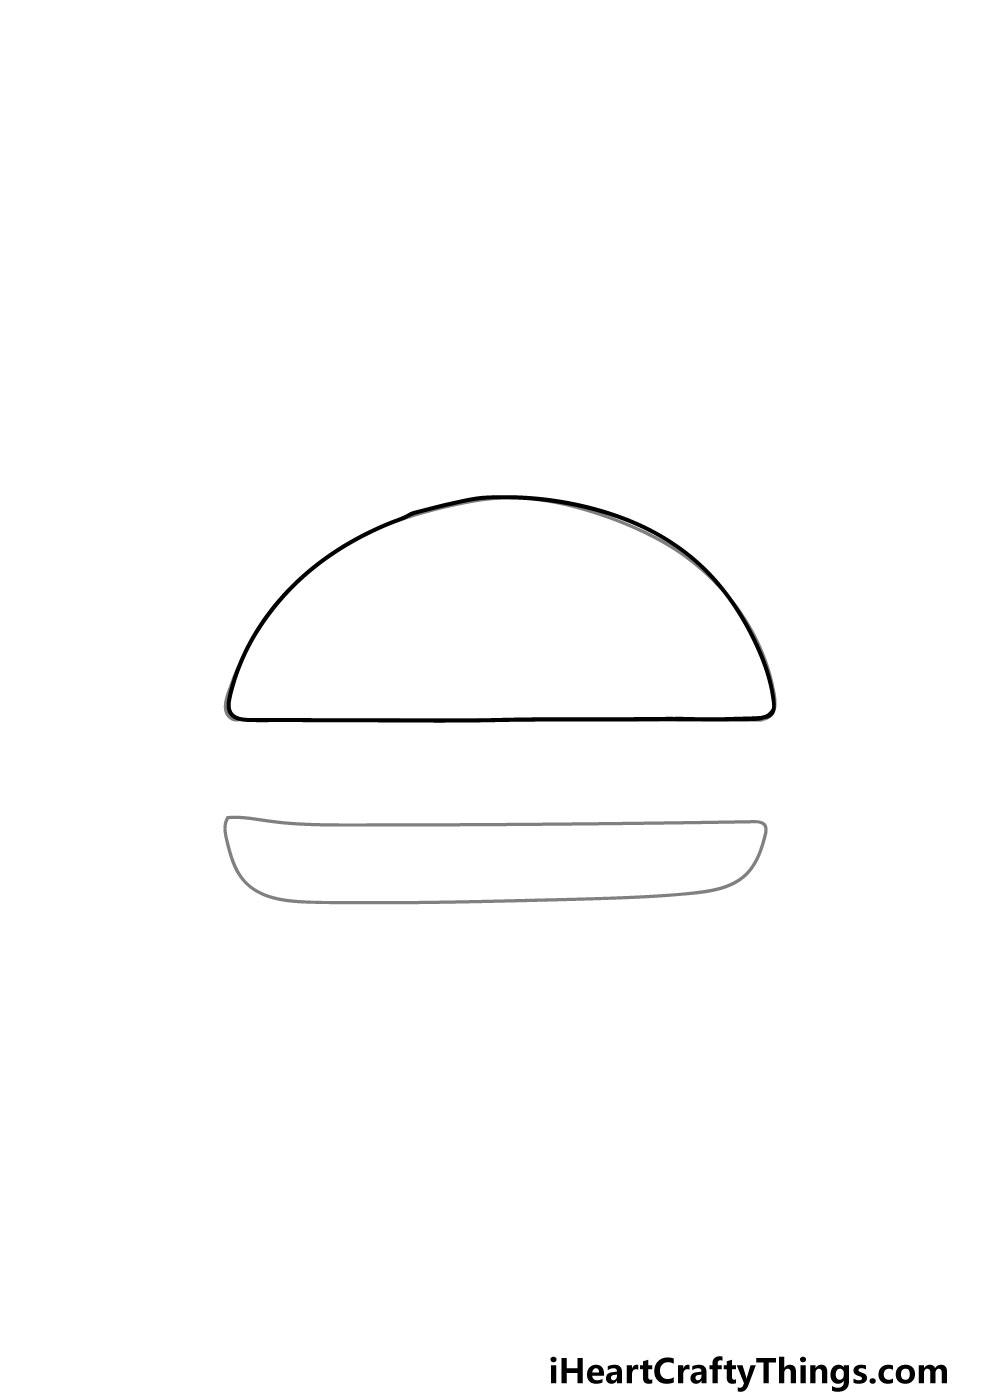 drawing a bun step 1